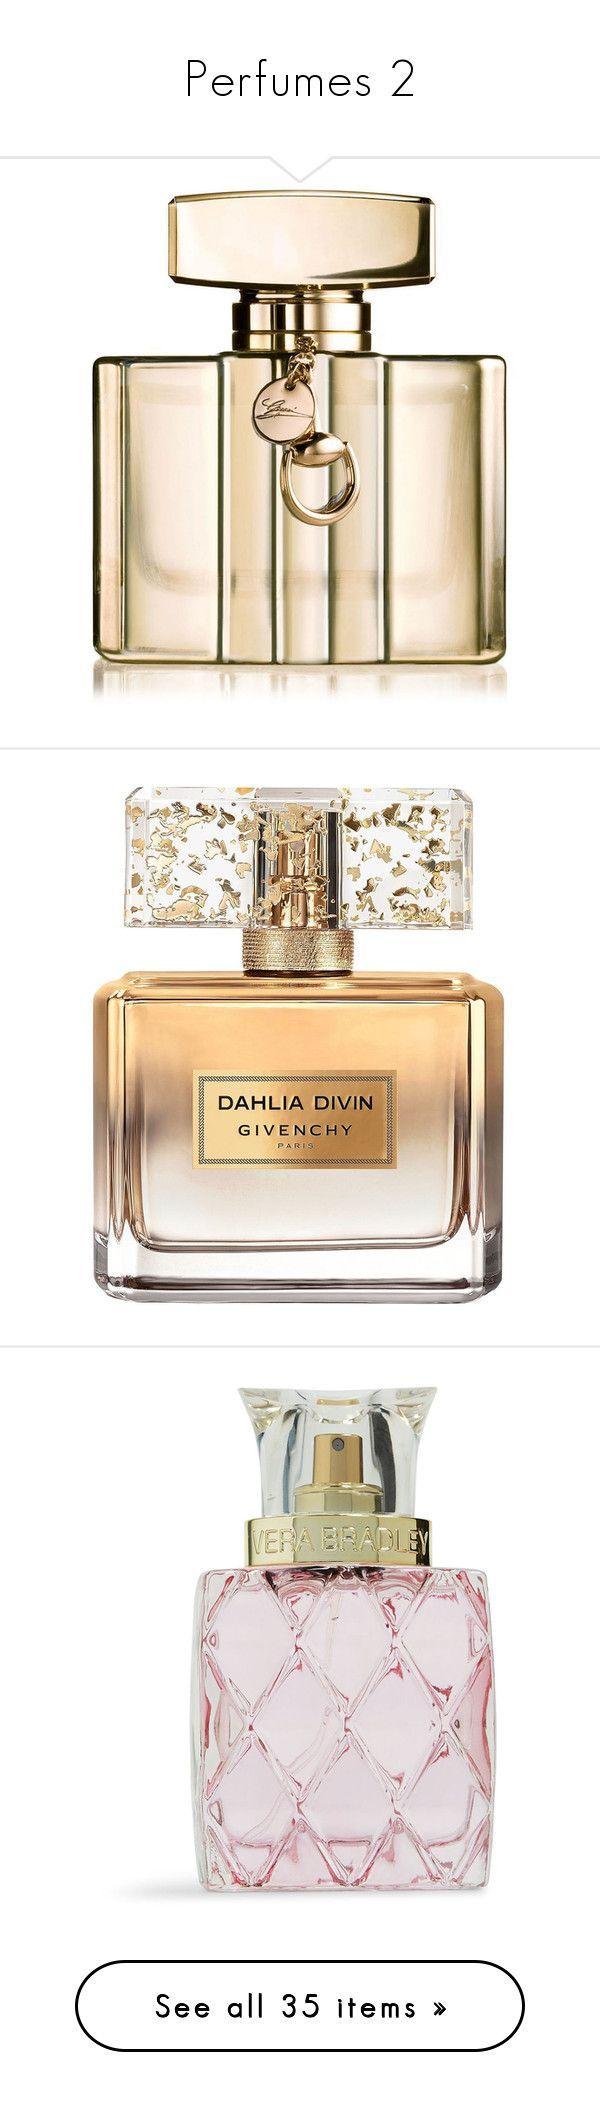 """Perfumes 2"" by livstephanovichi ❤ liked on Polyvore featuring beauty products, fragrance, edp perfume, blossom perfume, eau de parfum perfume, eau de perfume, gucci fragrance, perfume, beauty and makeup ***** More Info: www.dutyfreedepot.com/brandlist.aspx?brandsection=10&Intern=1opranda&bn=0"